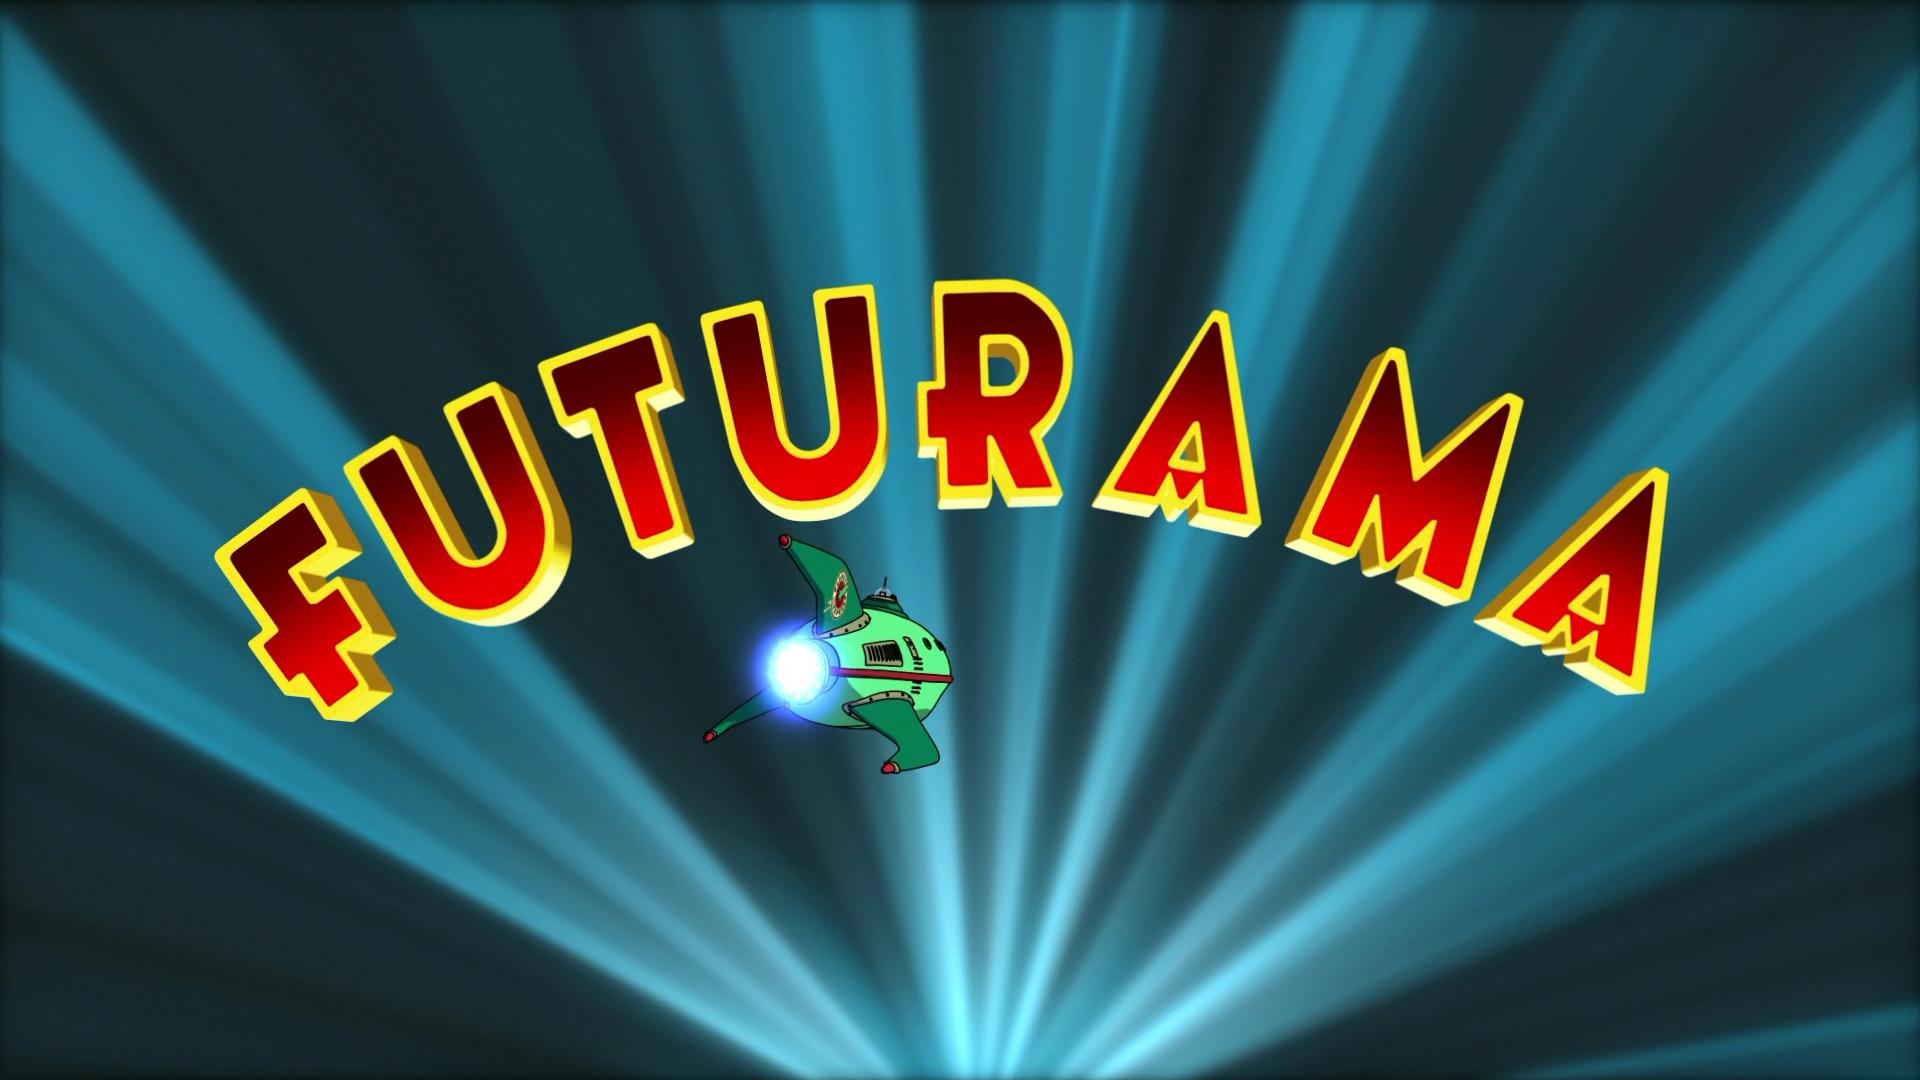 Futurama hd wallpaper background image 1920x1080 id - Futurama wallpaper ...